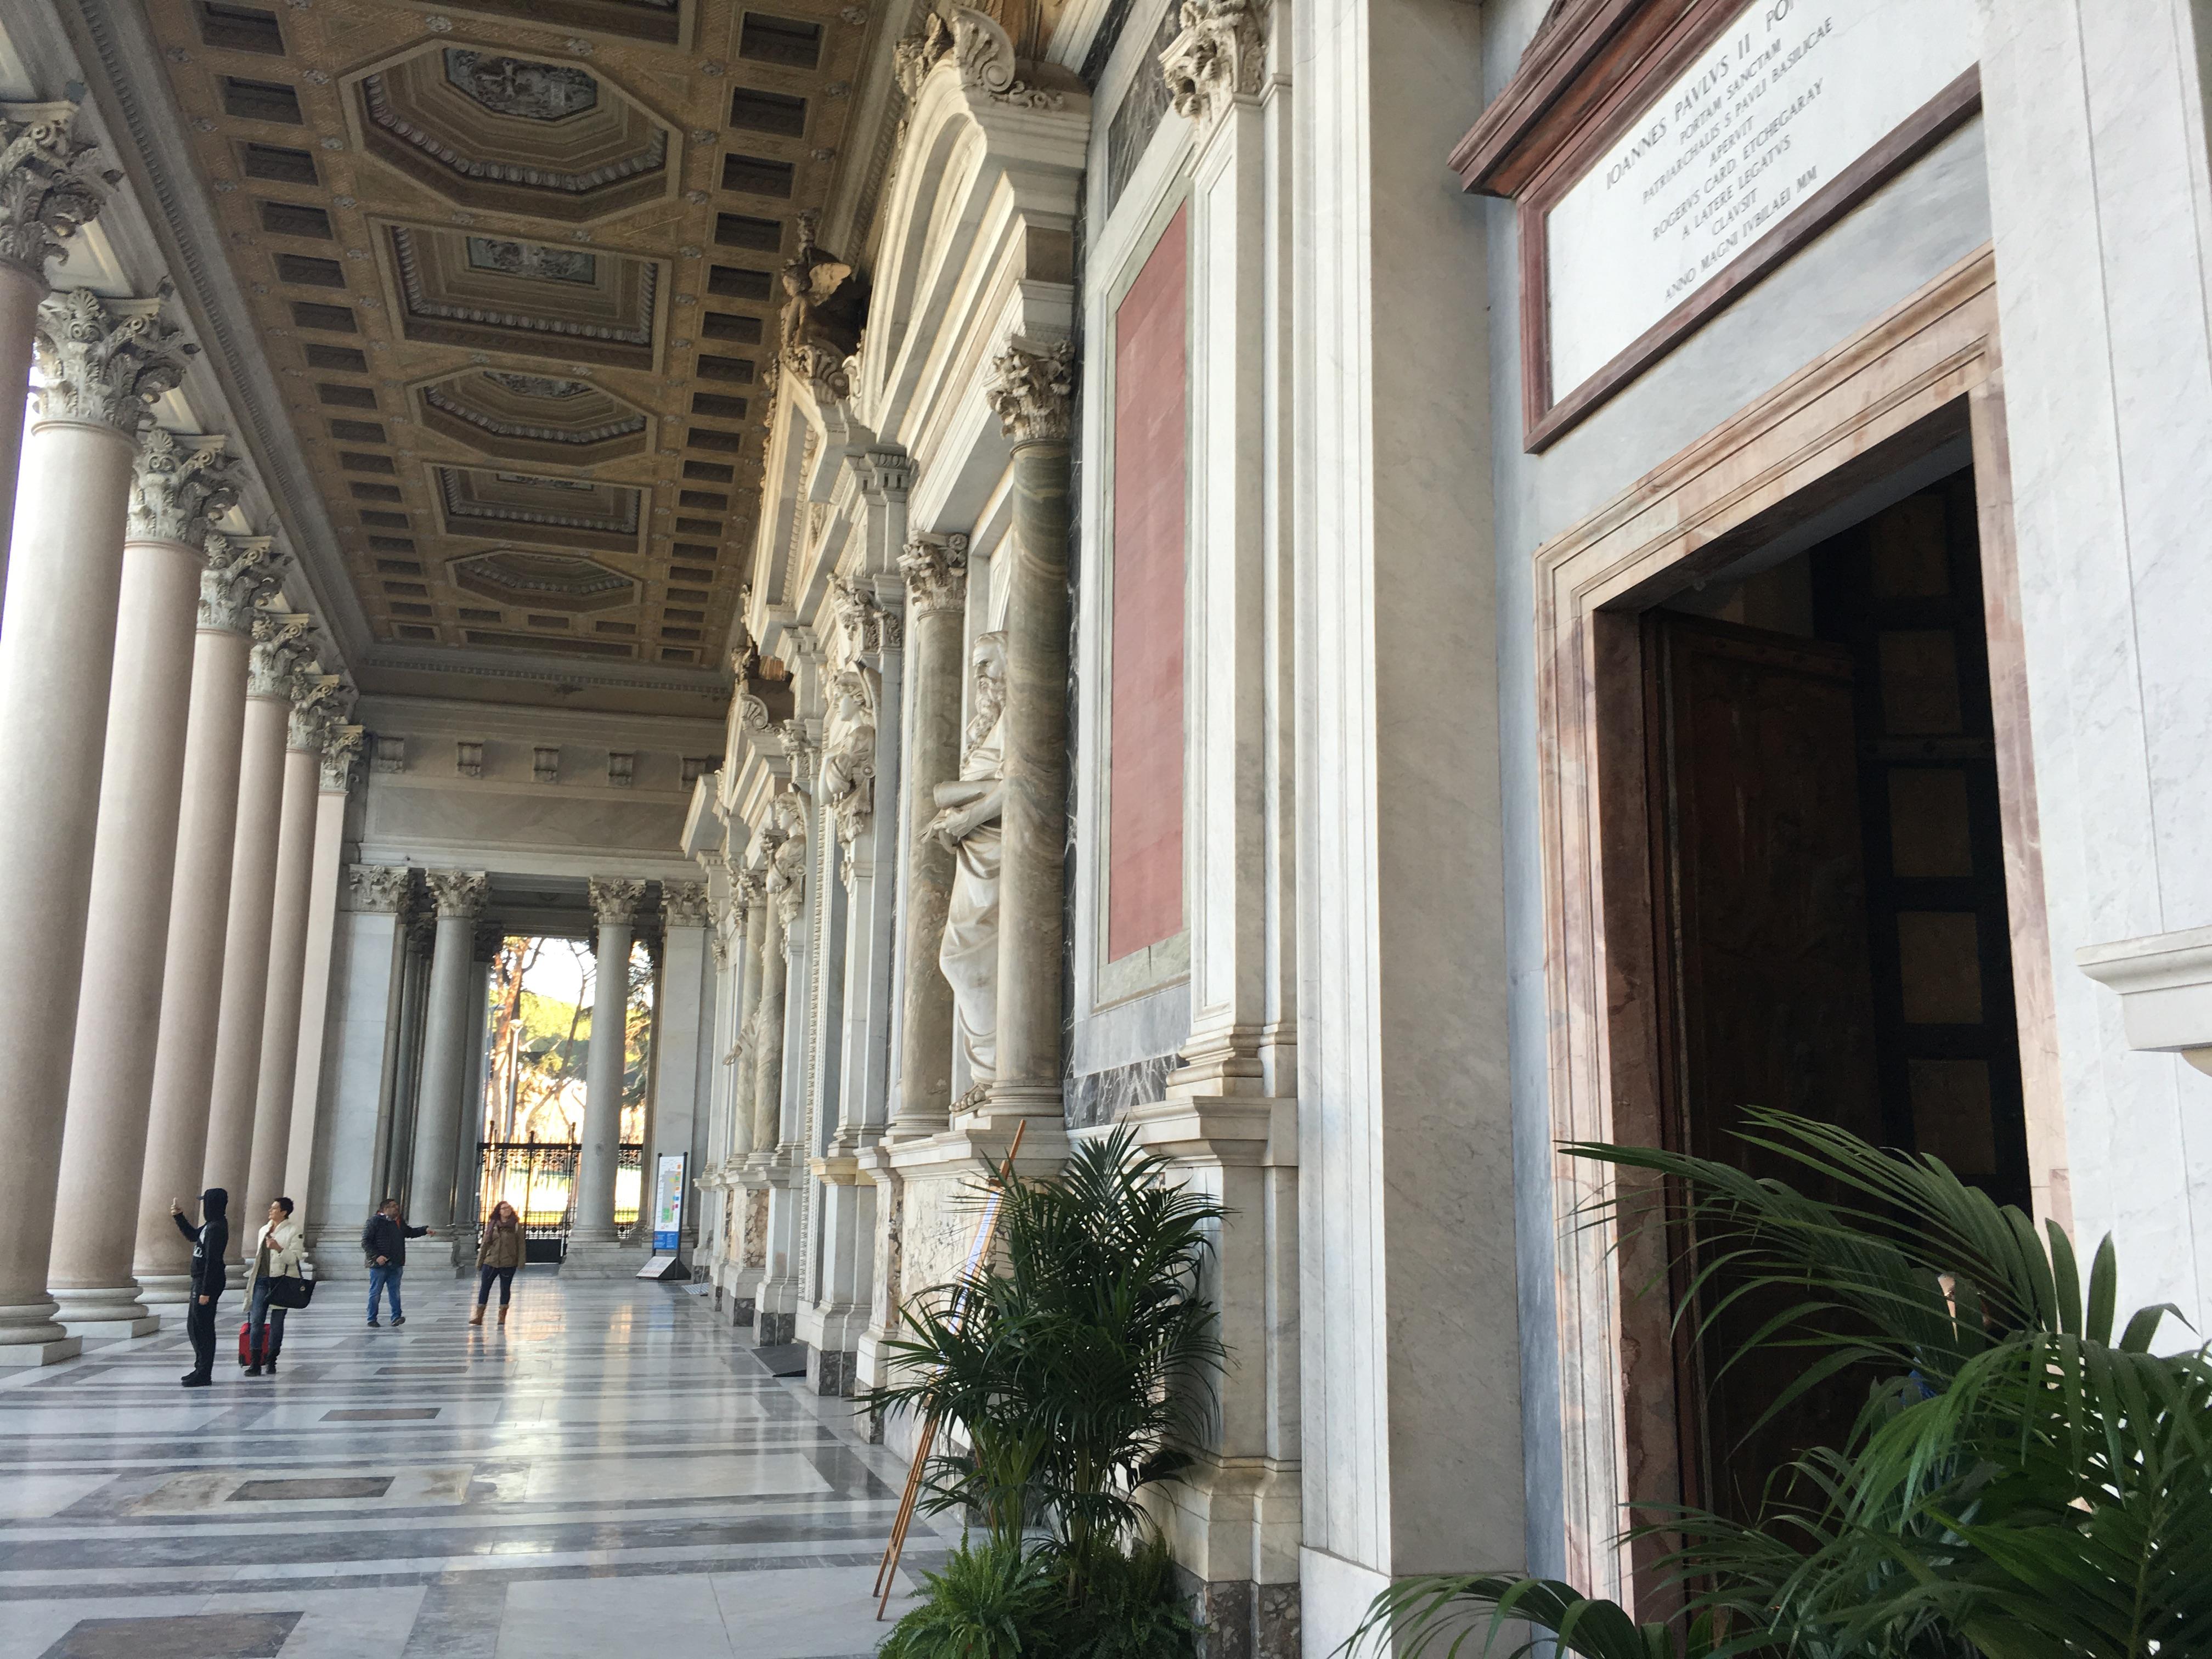 1. St. Paul's - Outside Rome